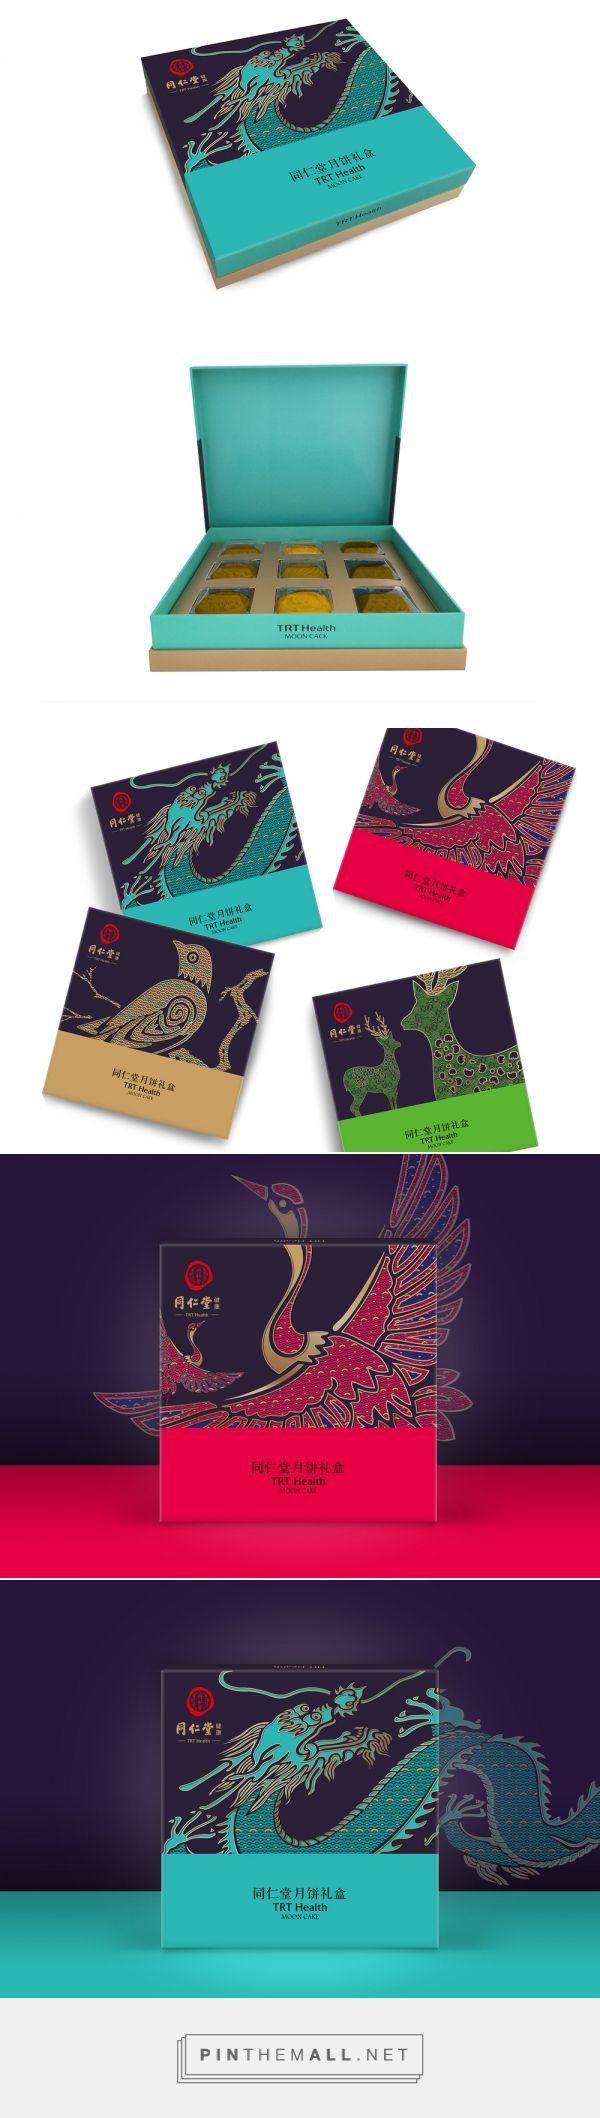 TRT Health Moon Cake 2015 — The Dieline - Branding & Packaging - created via http://pinthemall.net